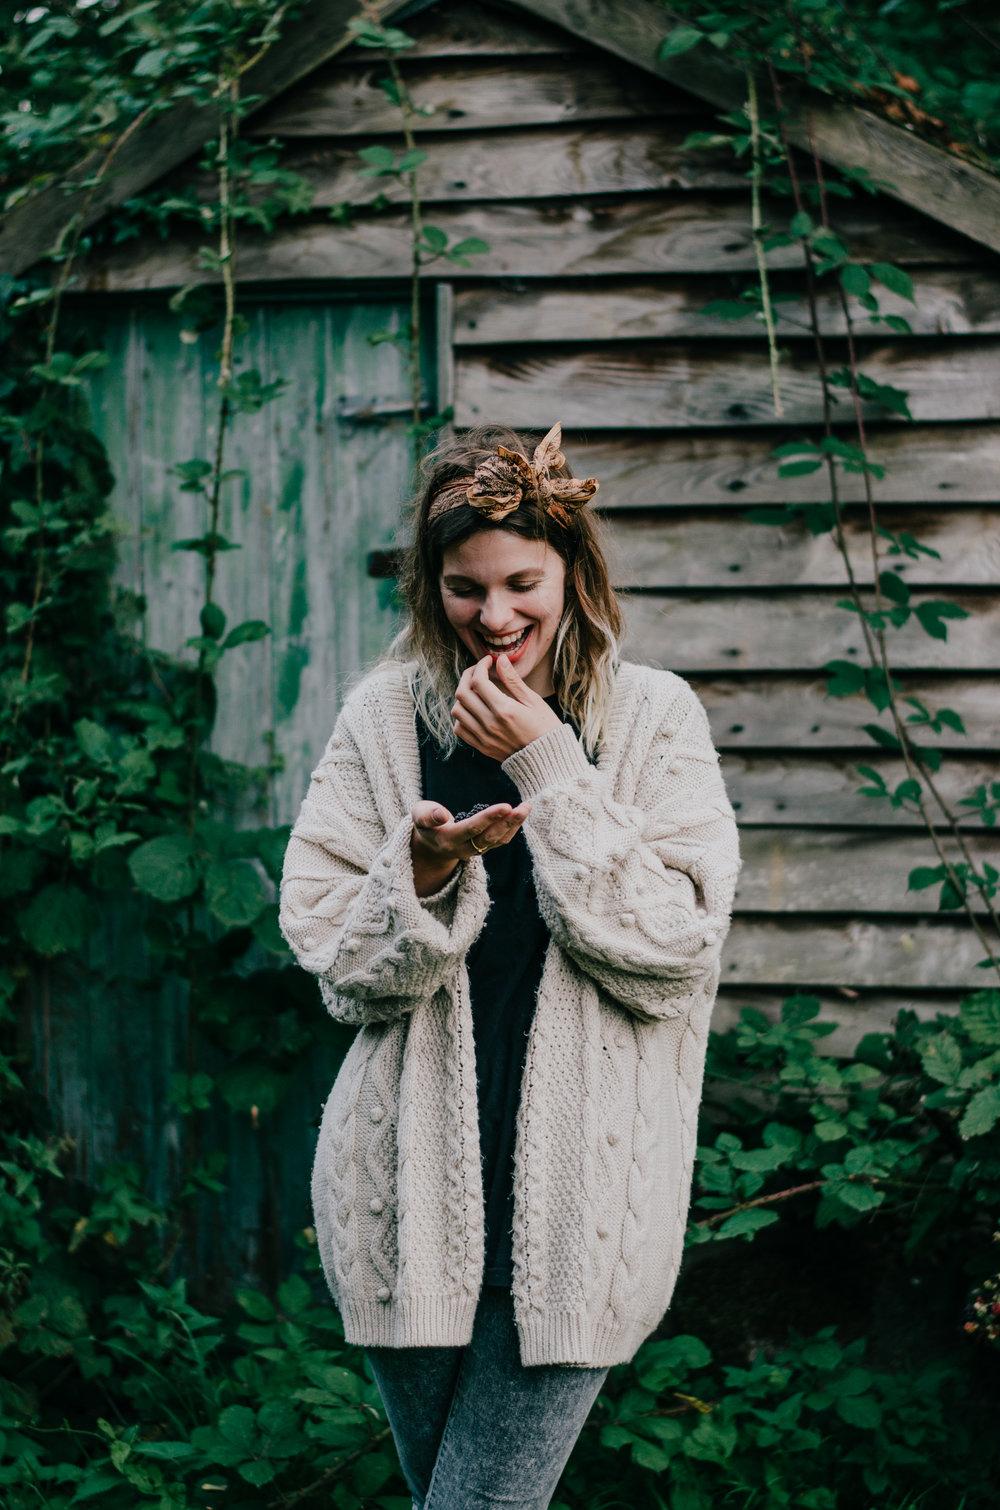 Slow Living Autumn Portraits - Aiste Saulyte Photography-2.jpg